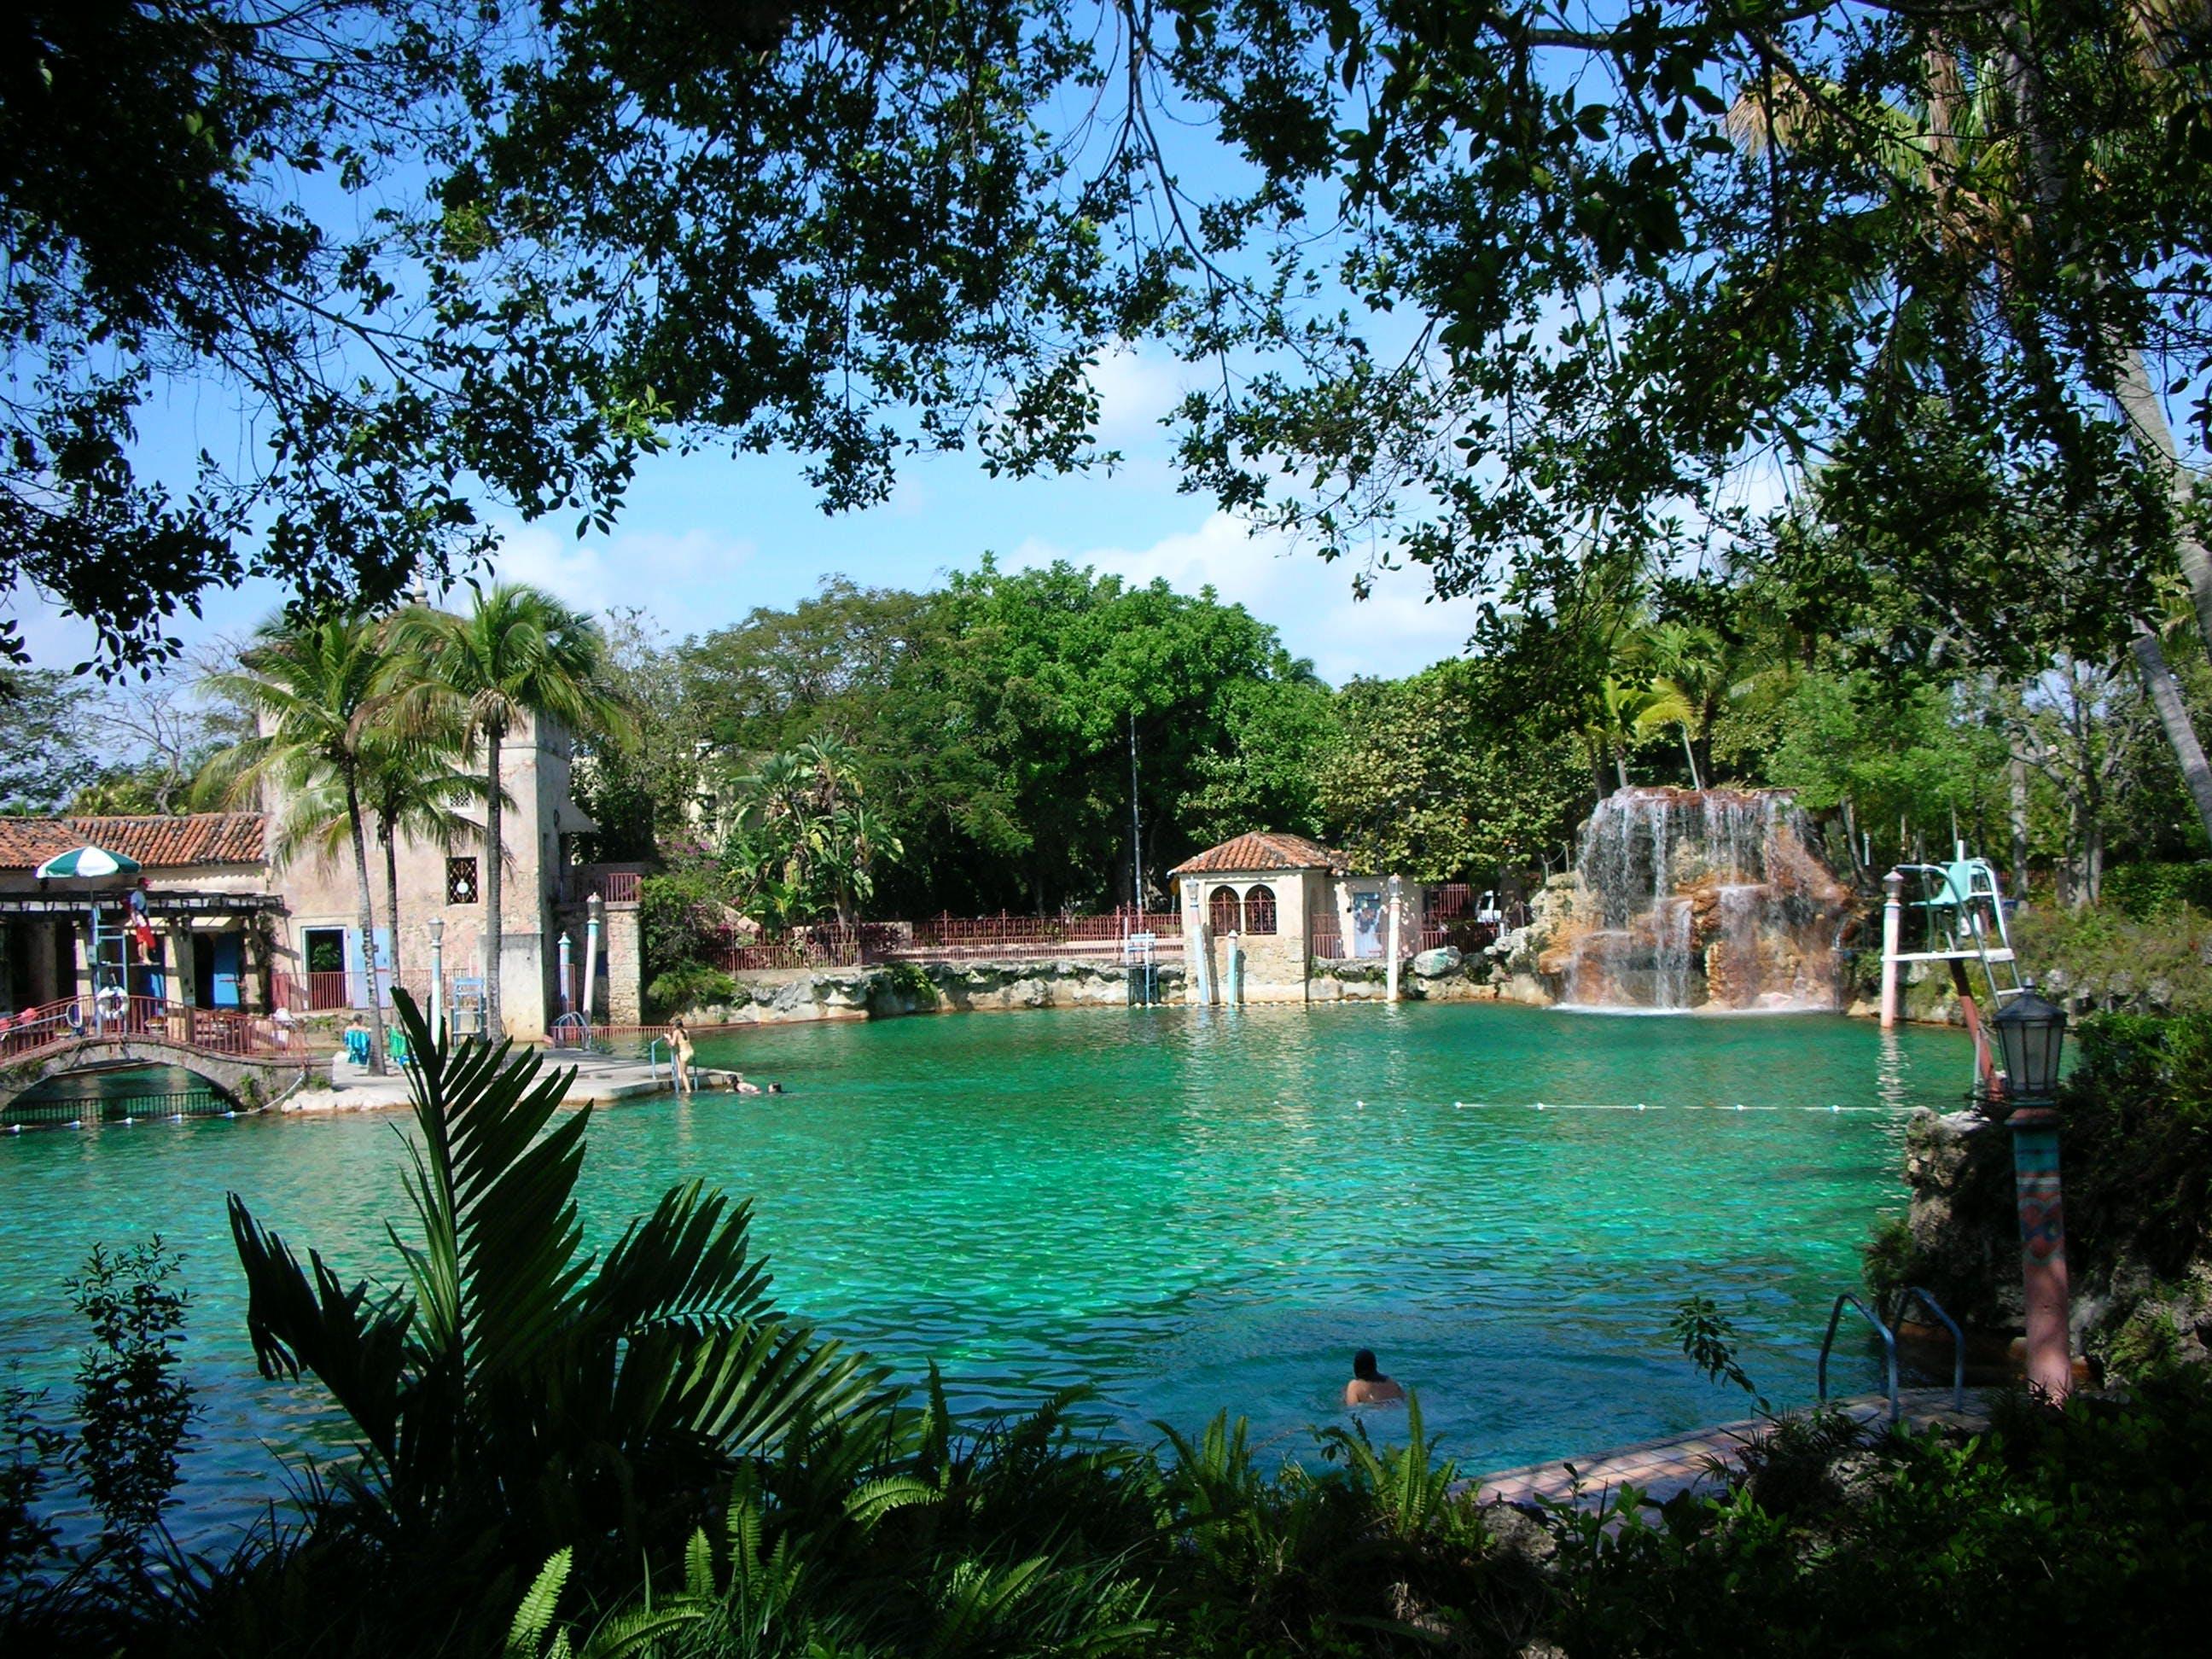 venetian pool swim miami tourist attractions